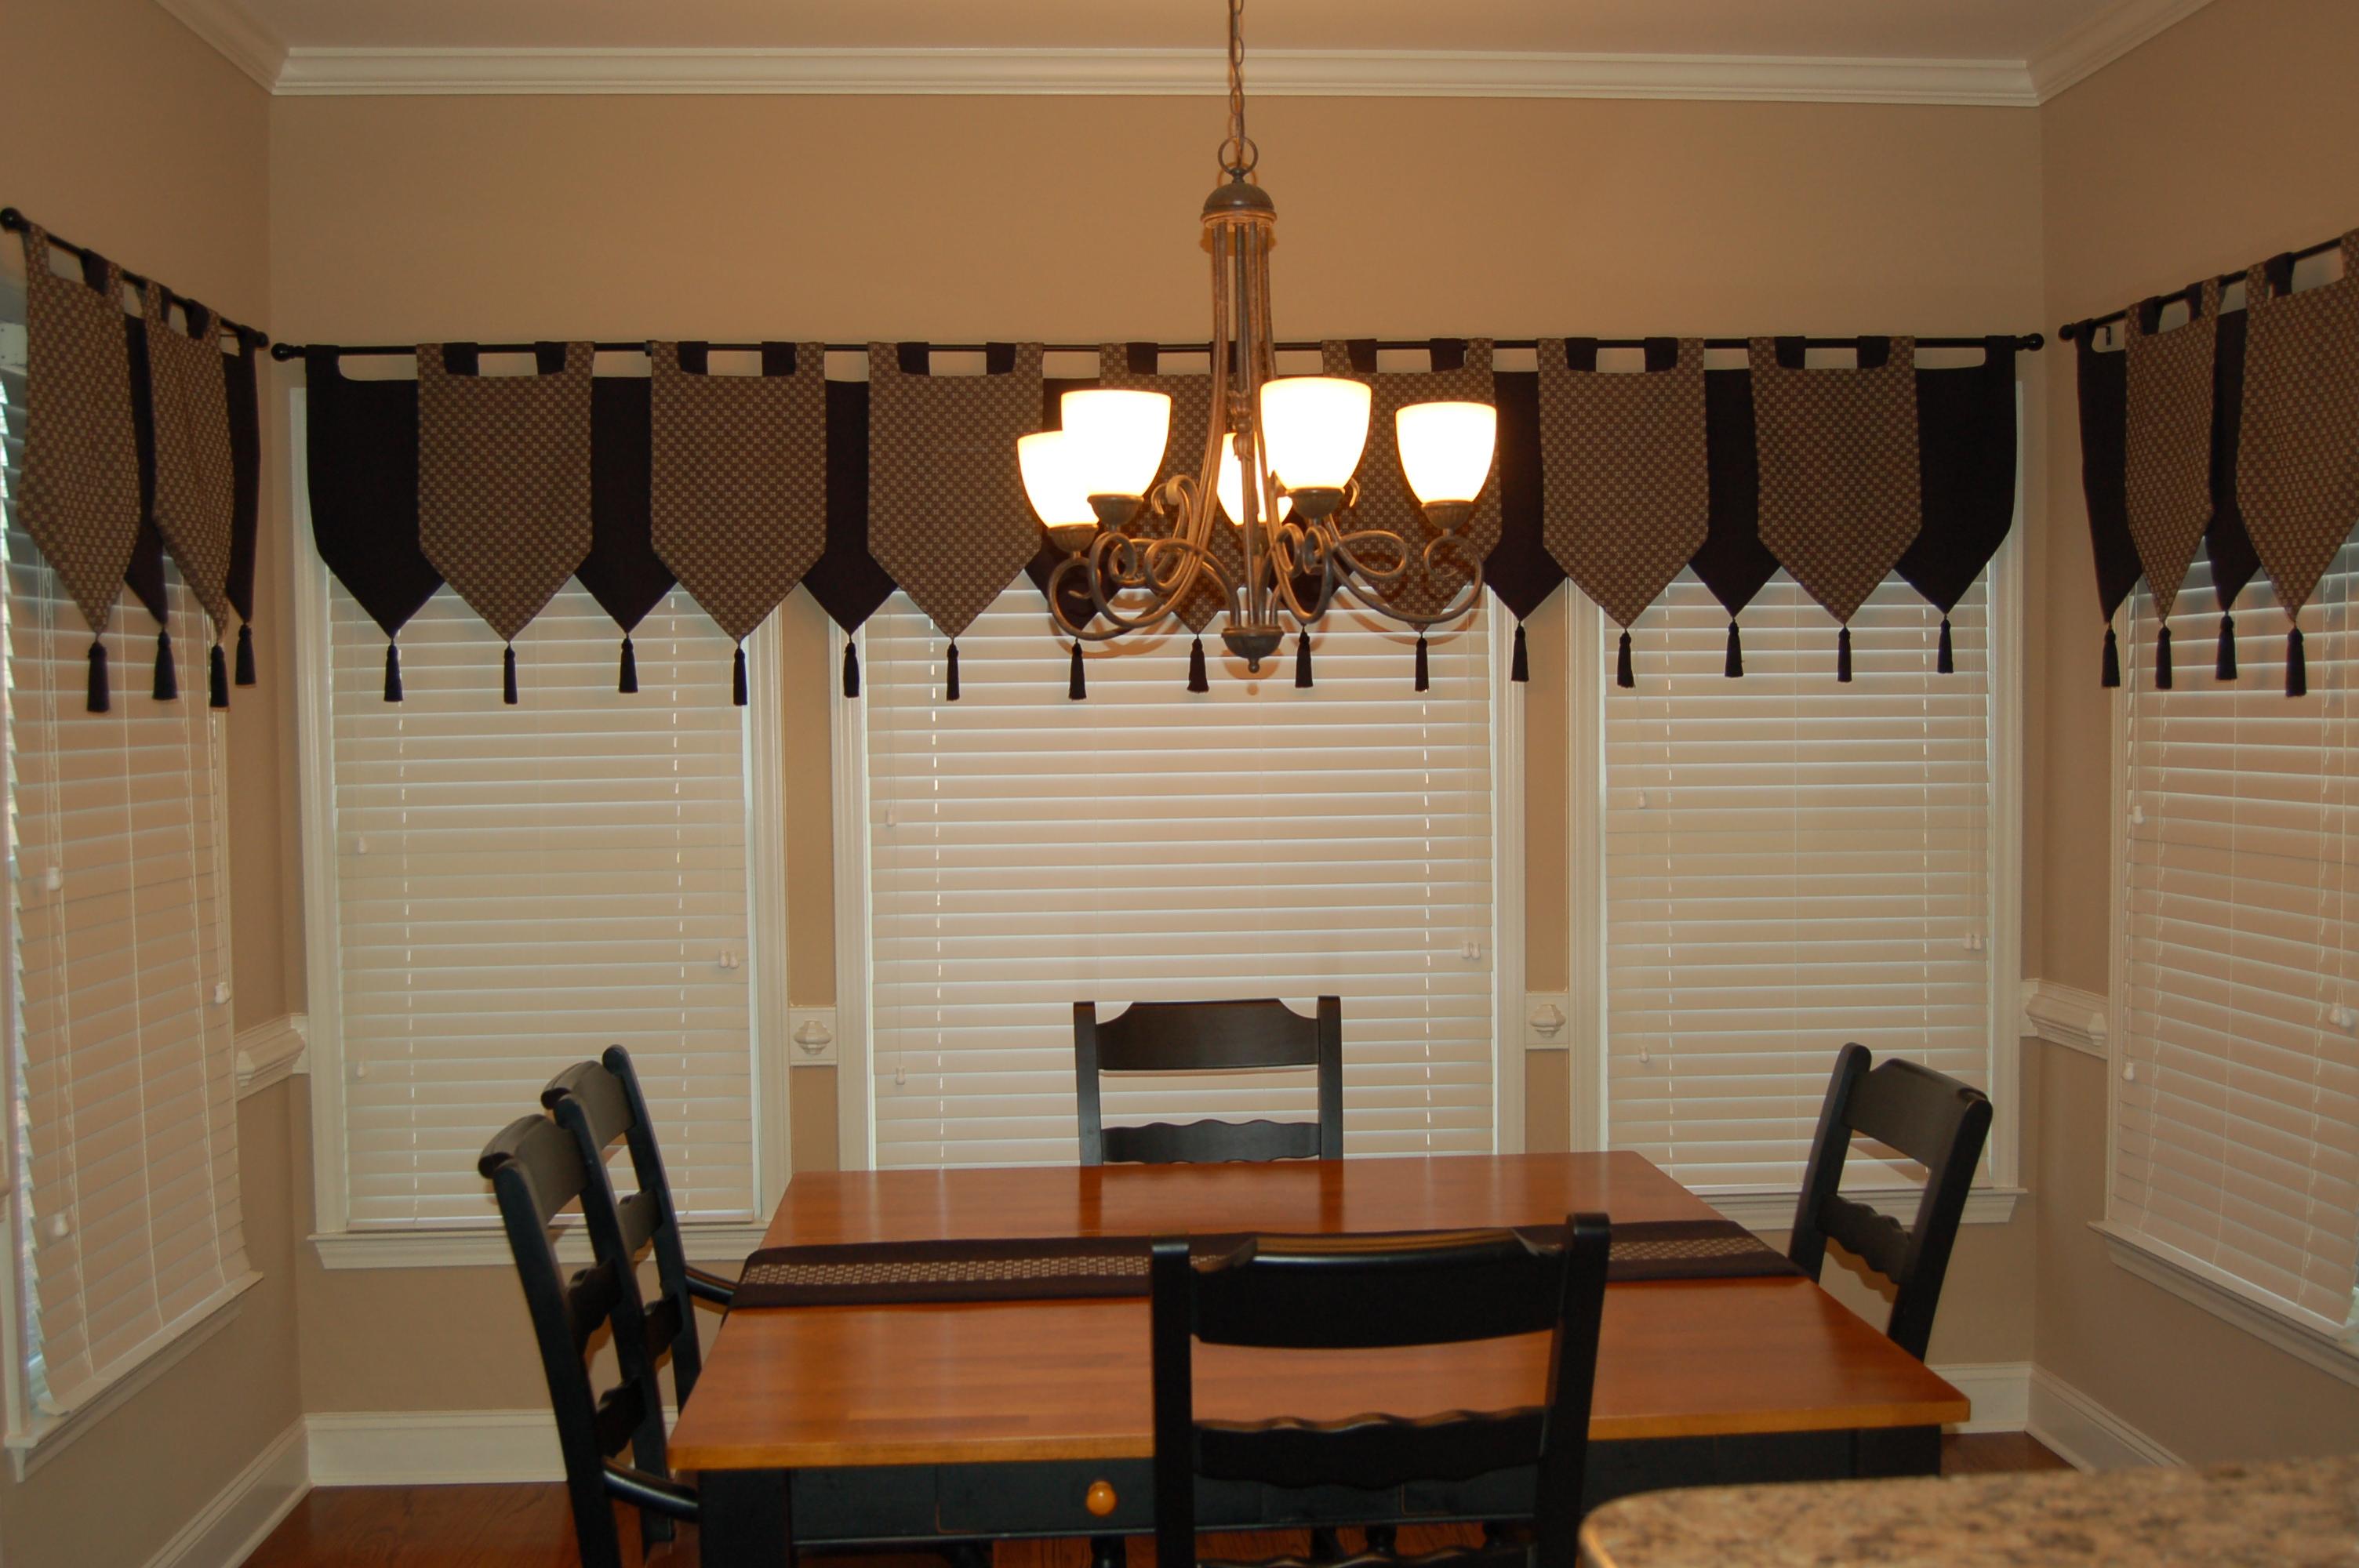 Kitchen door curtains photo - 3